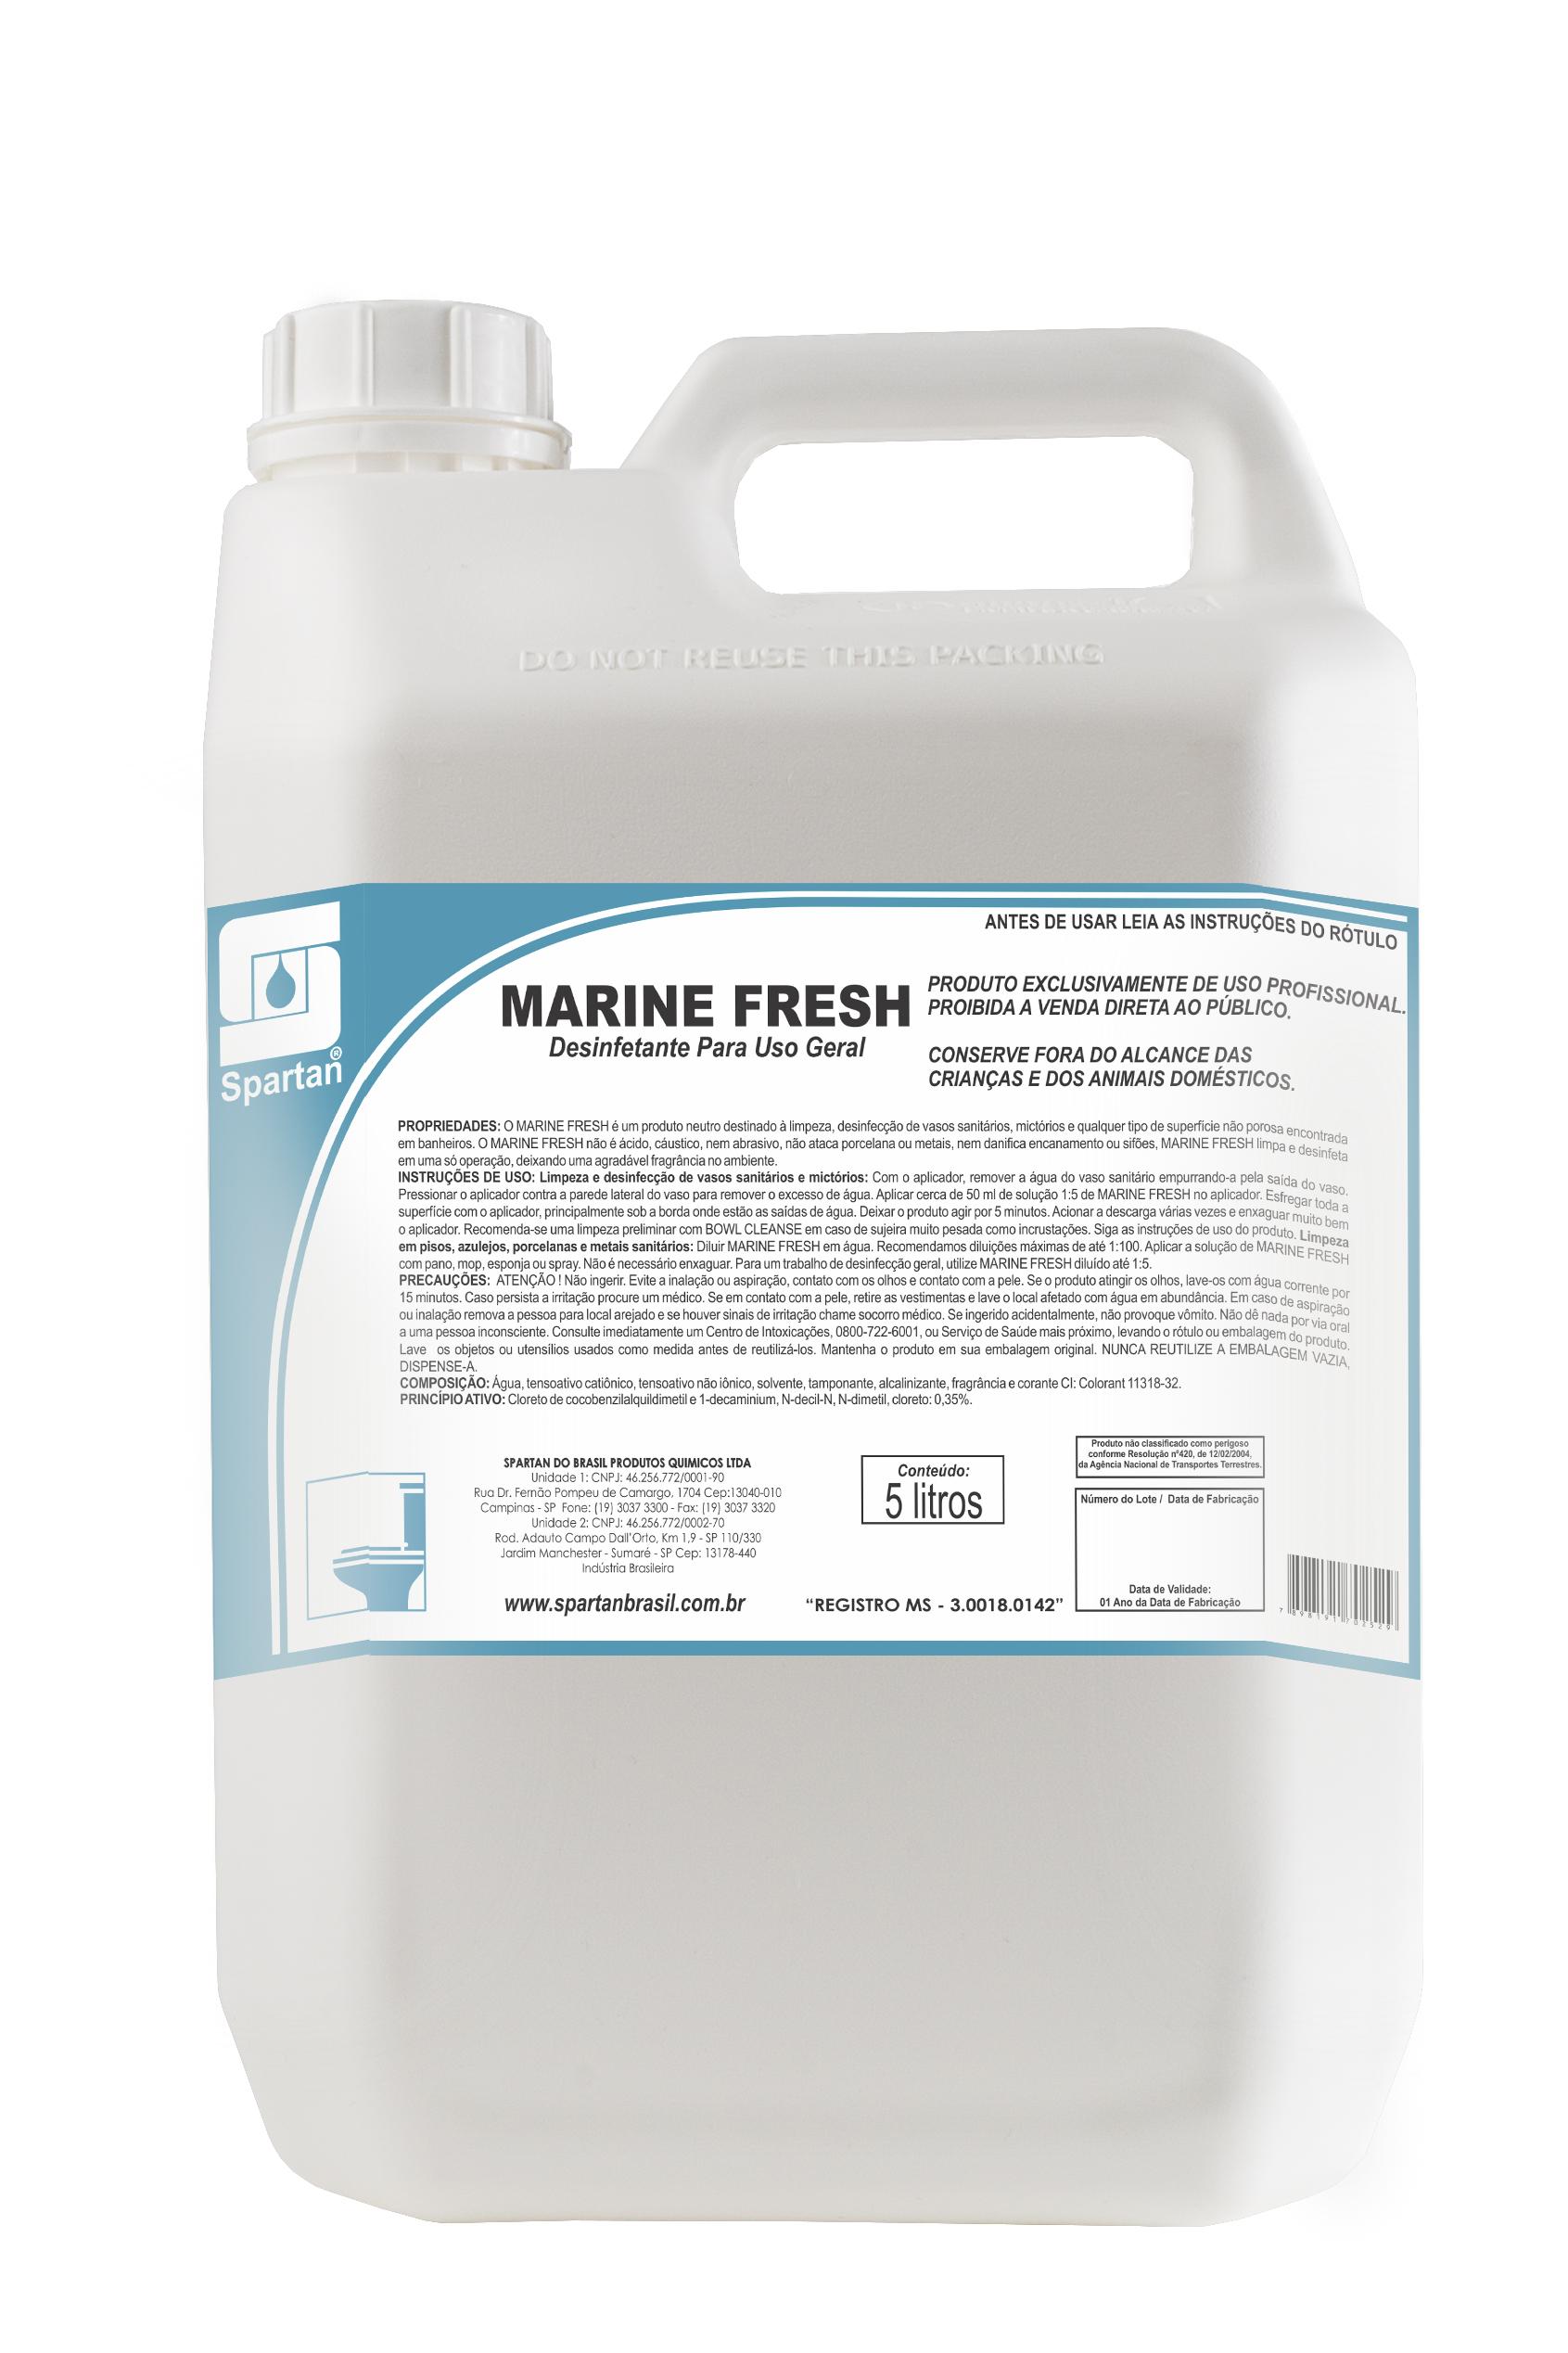 Marine Fresh